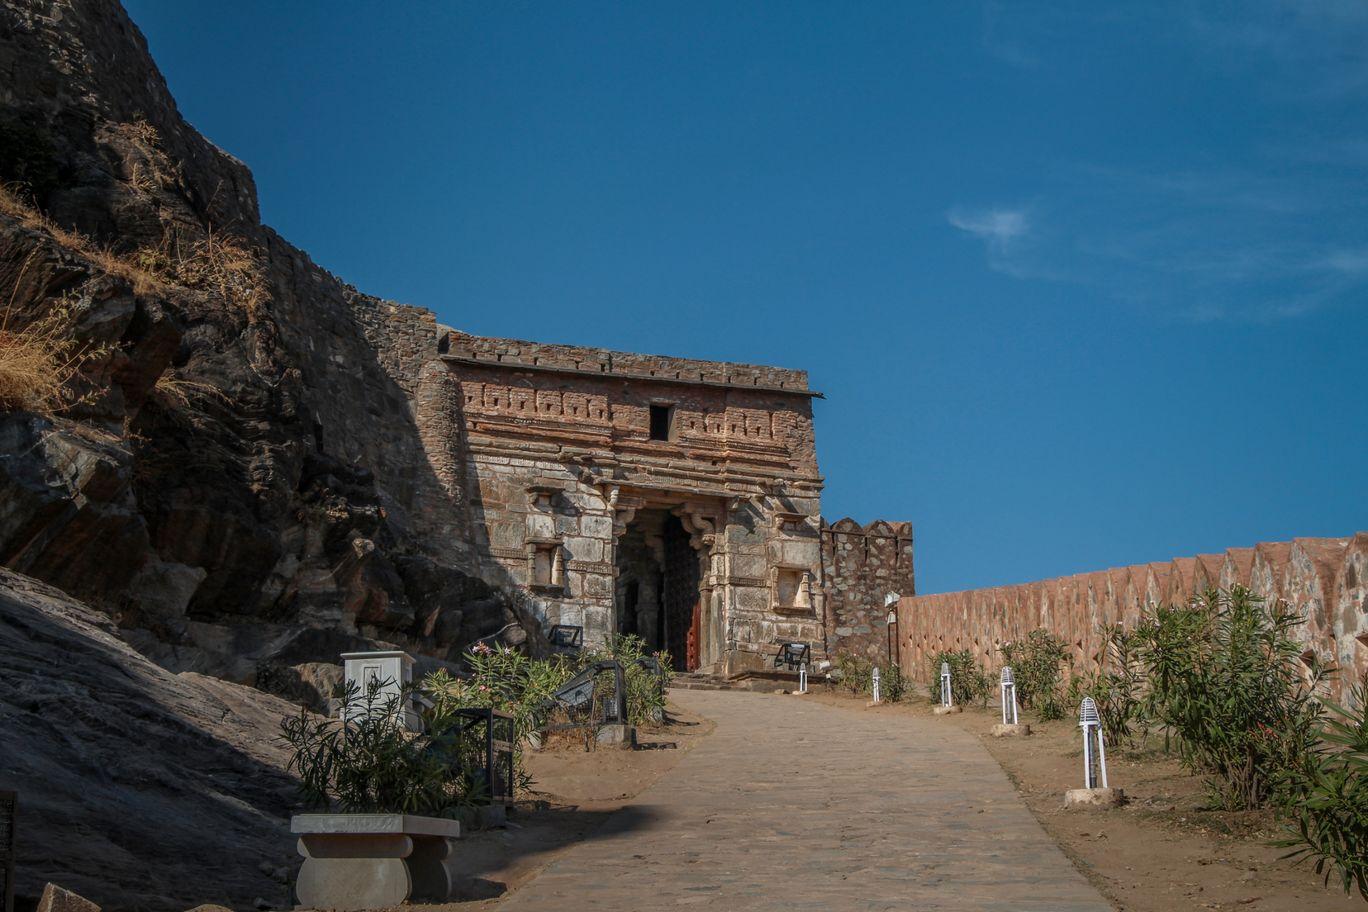 Photo of Kumbhalgarh Fort By Prashant Mane